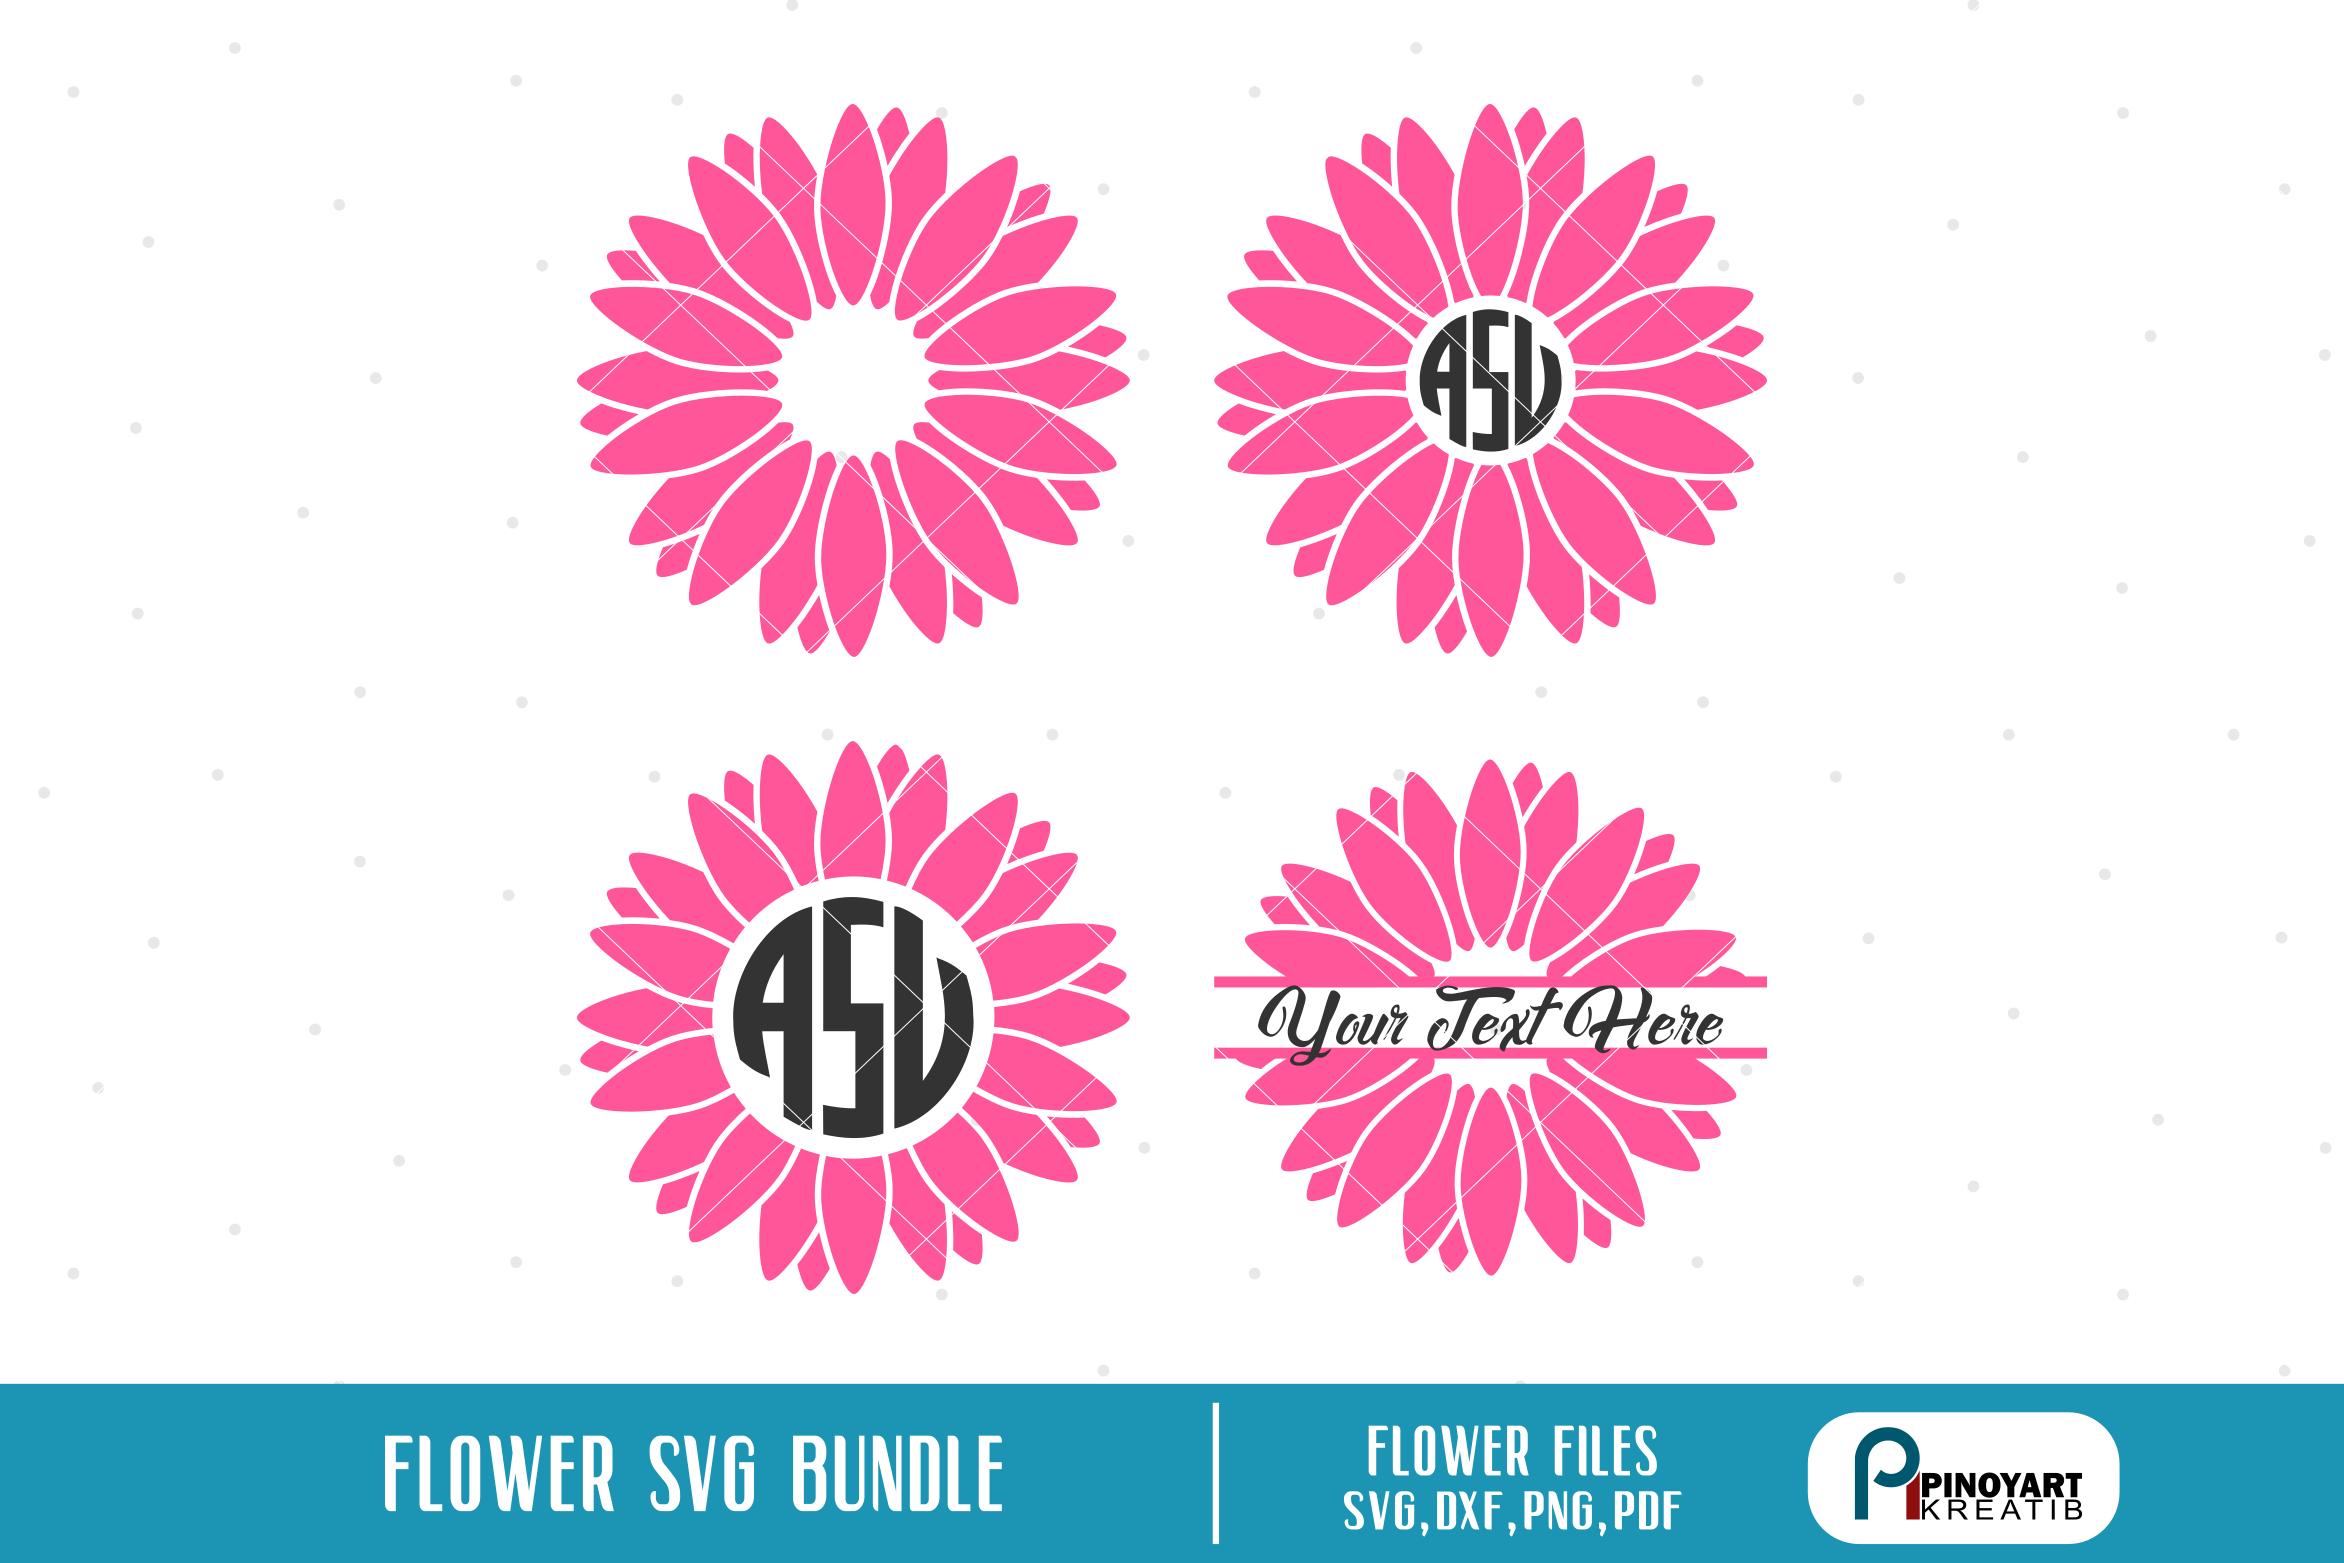 flower svg,flower clip art,flower svg file,flower cut file